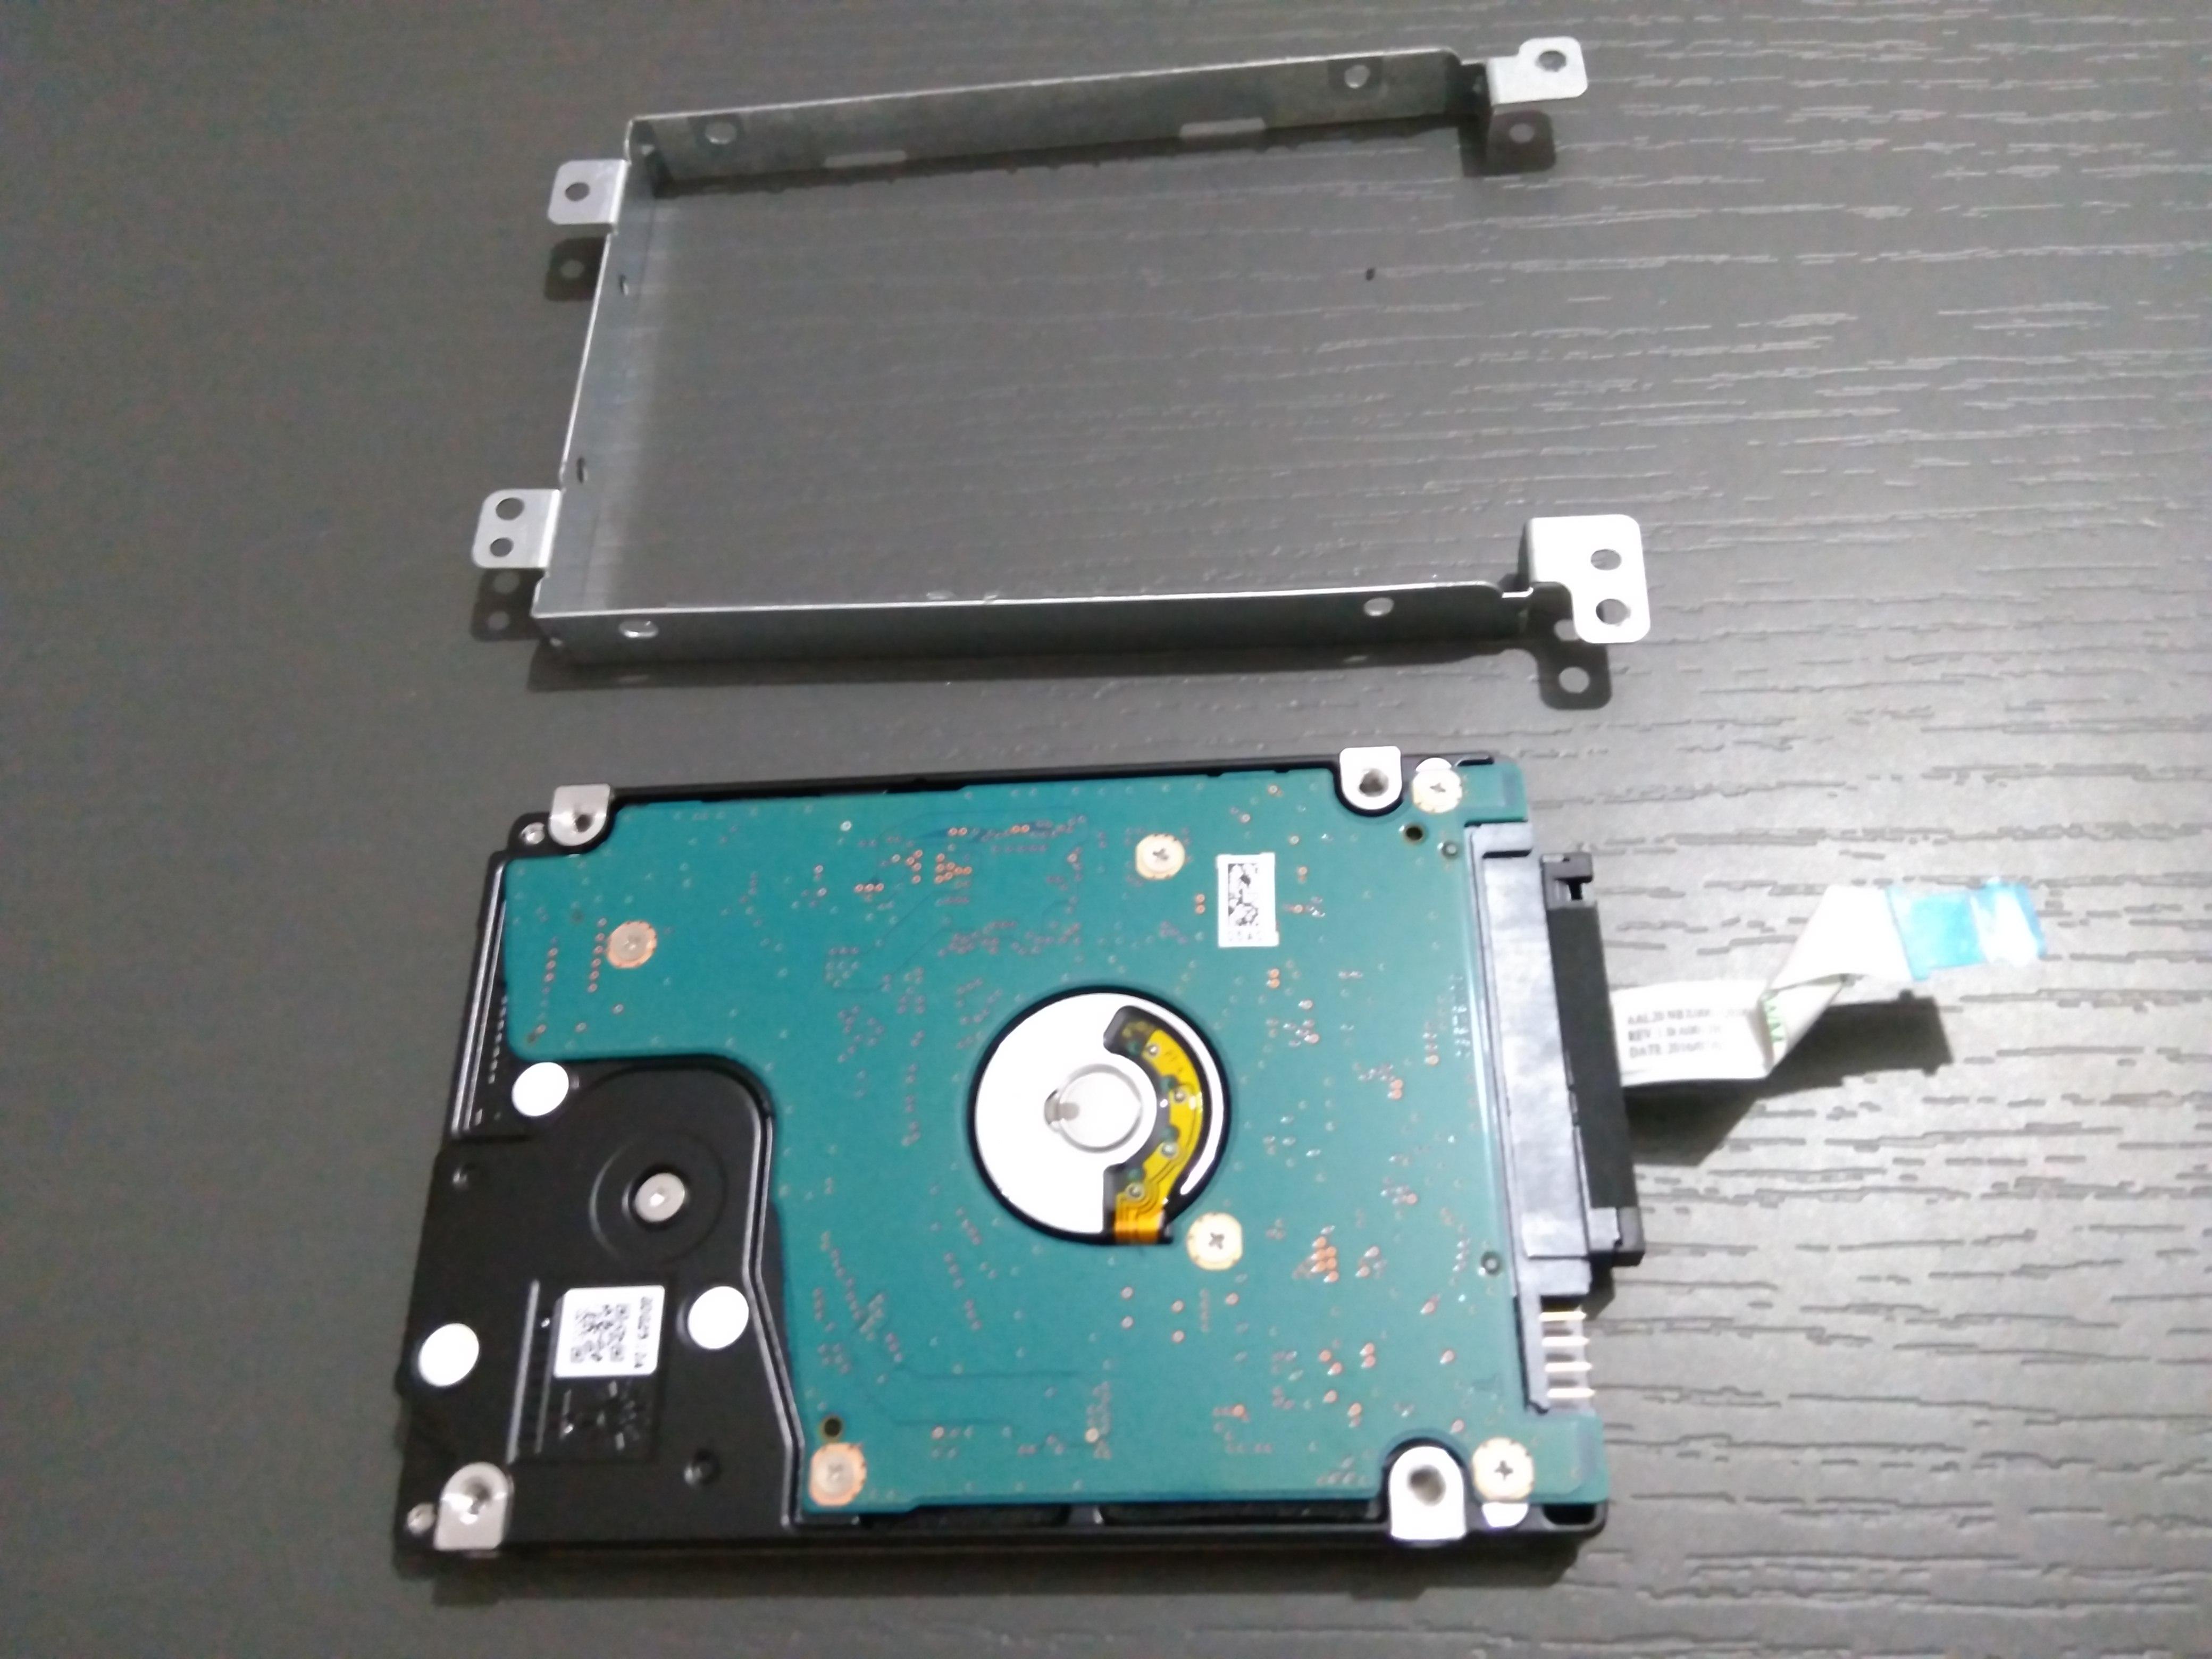 HW - Upgrade laptop with an SSD drive - SomoIT net